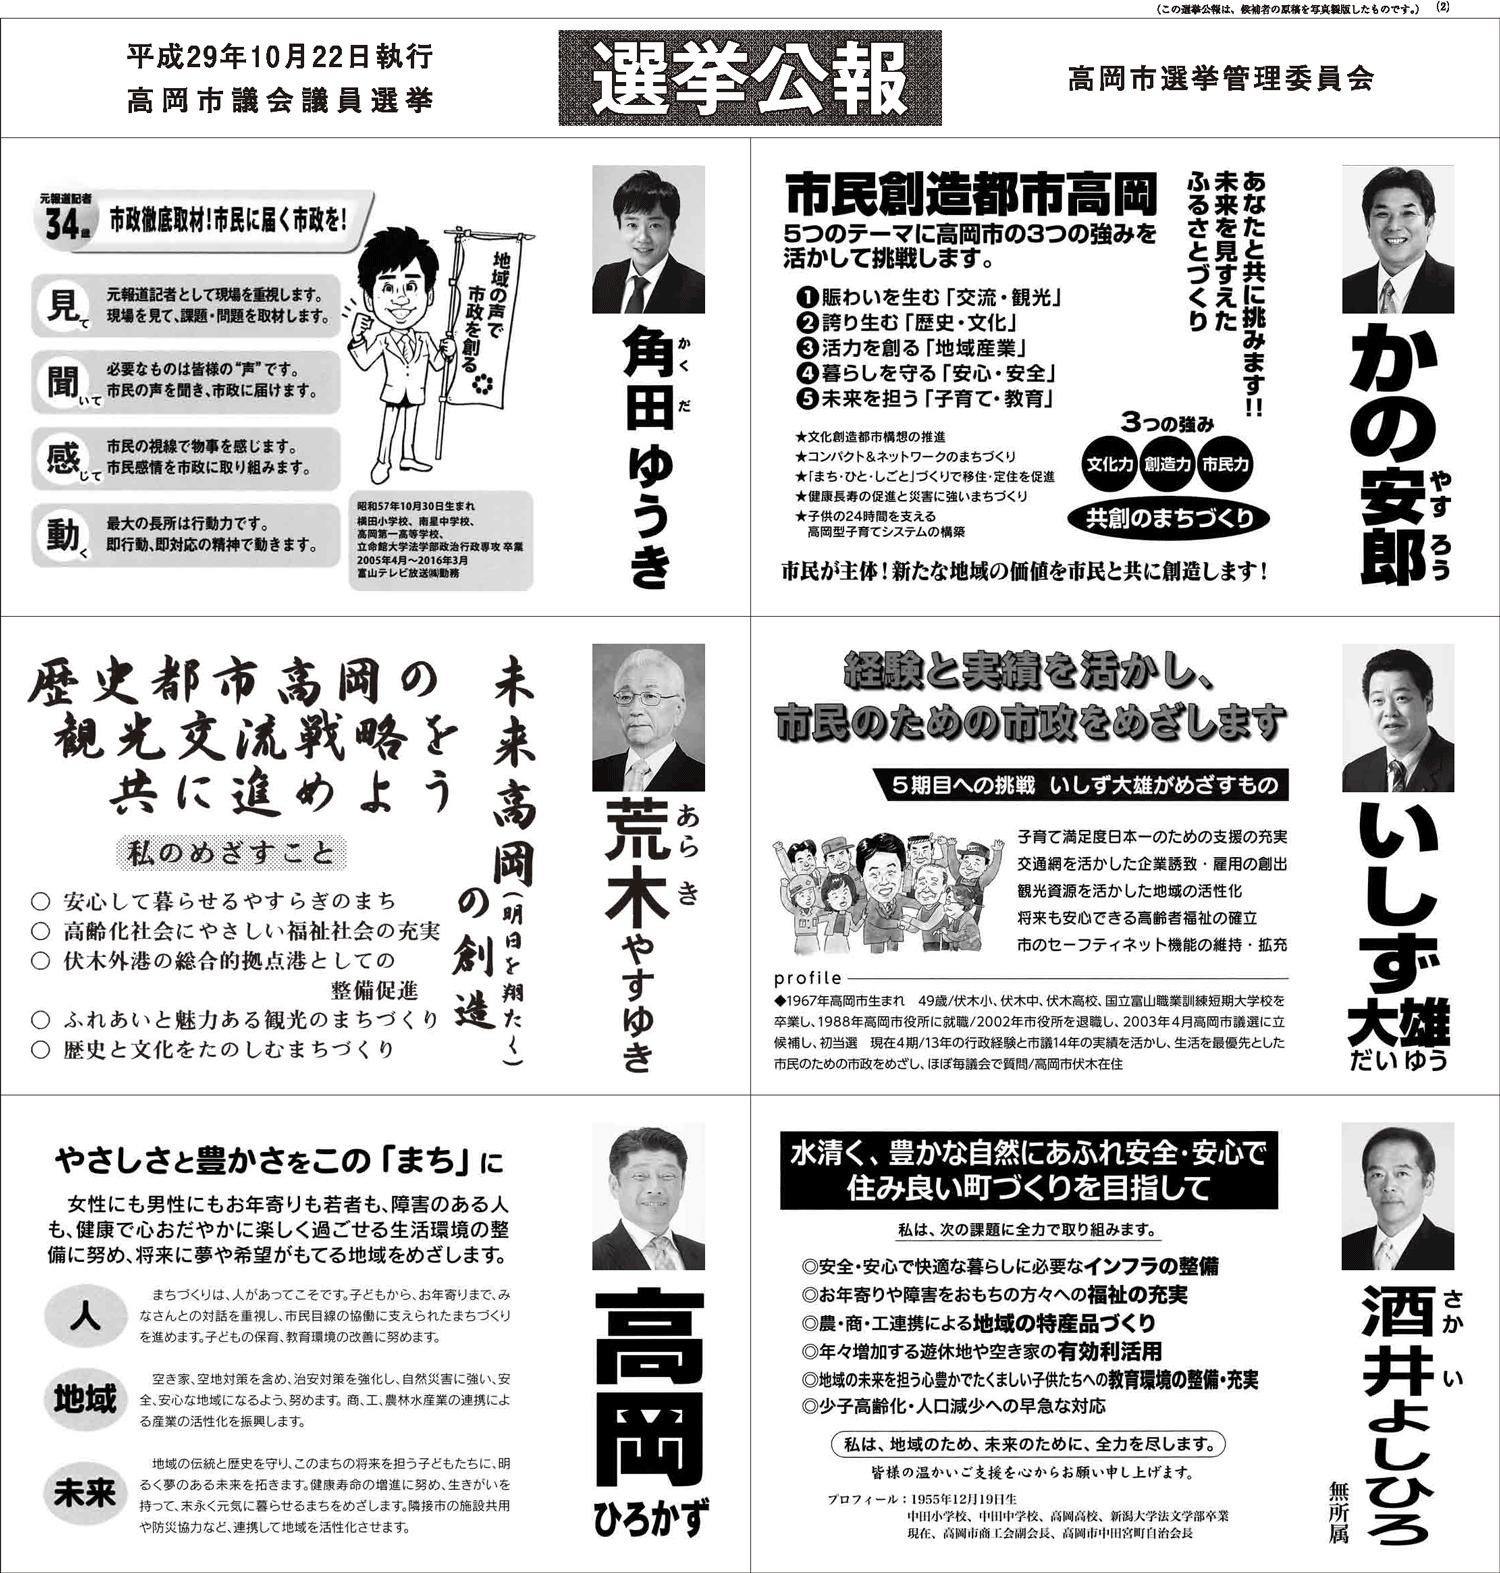 高岡市議会議員選挙2017の選挙公報2